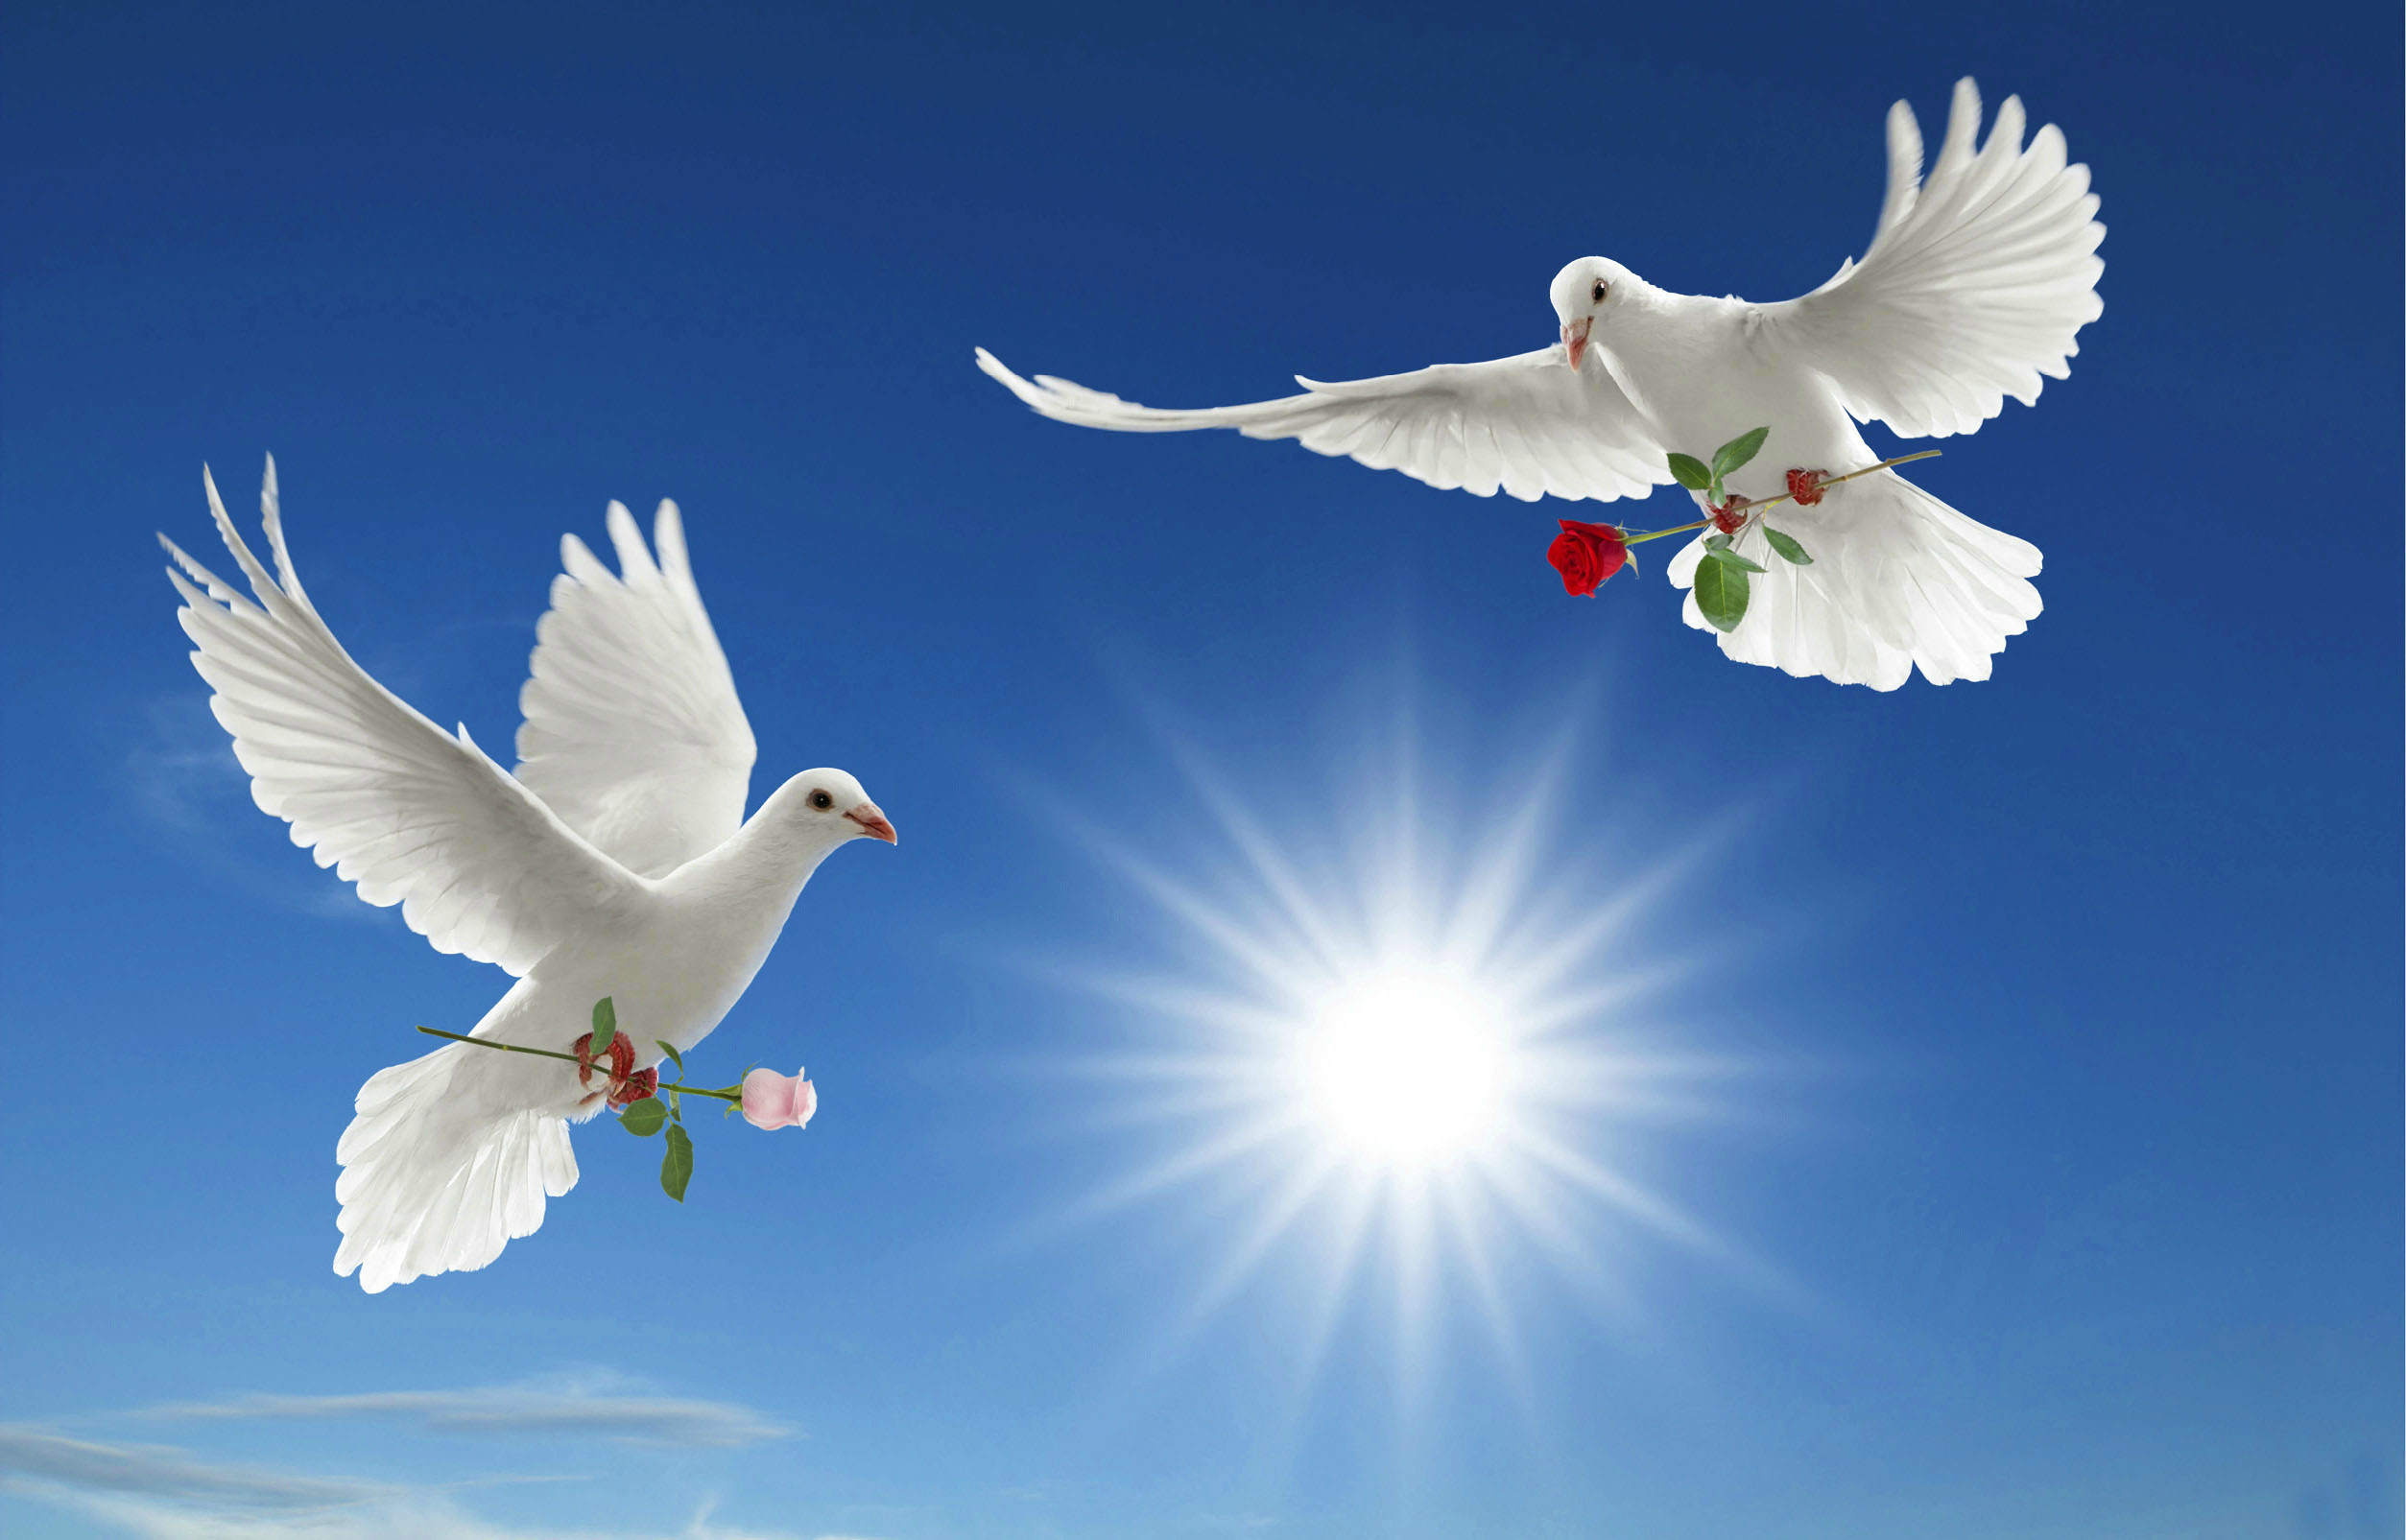 JYJSnEO World Peace Wallpaper